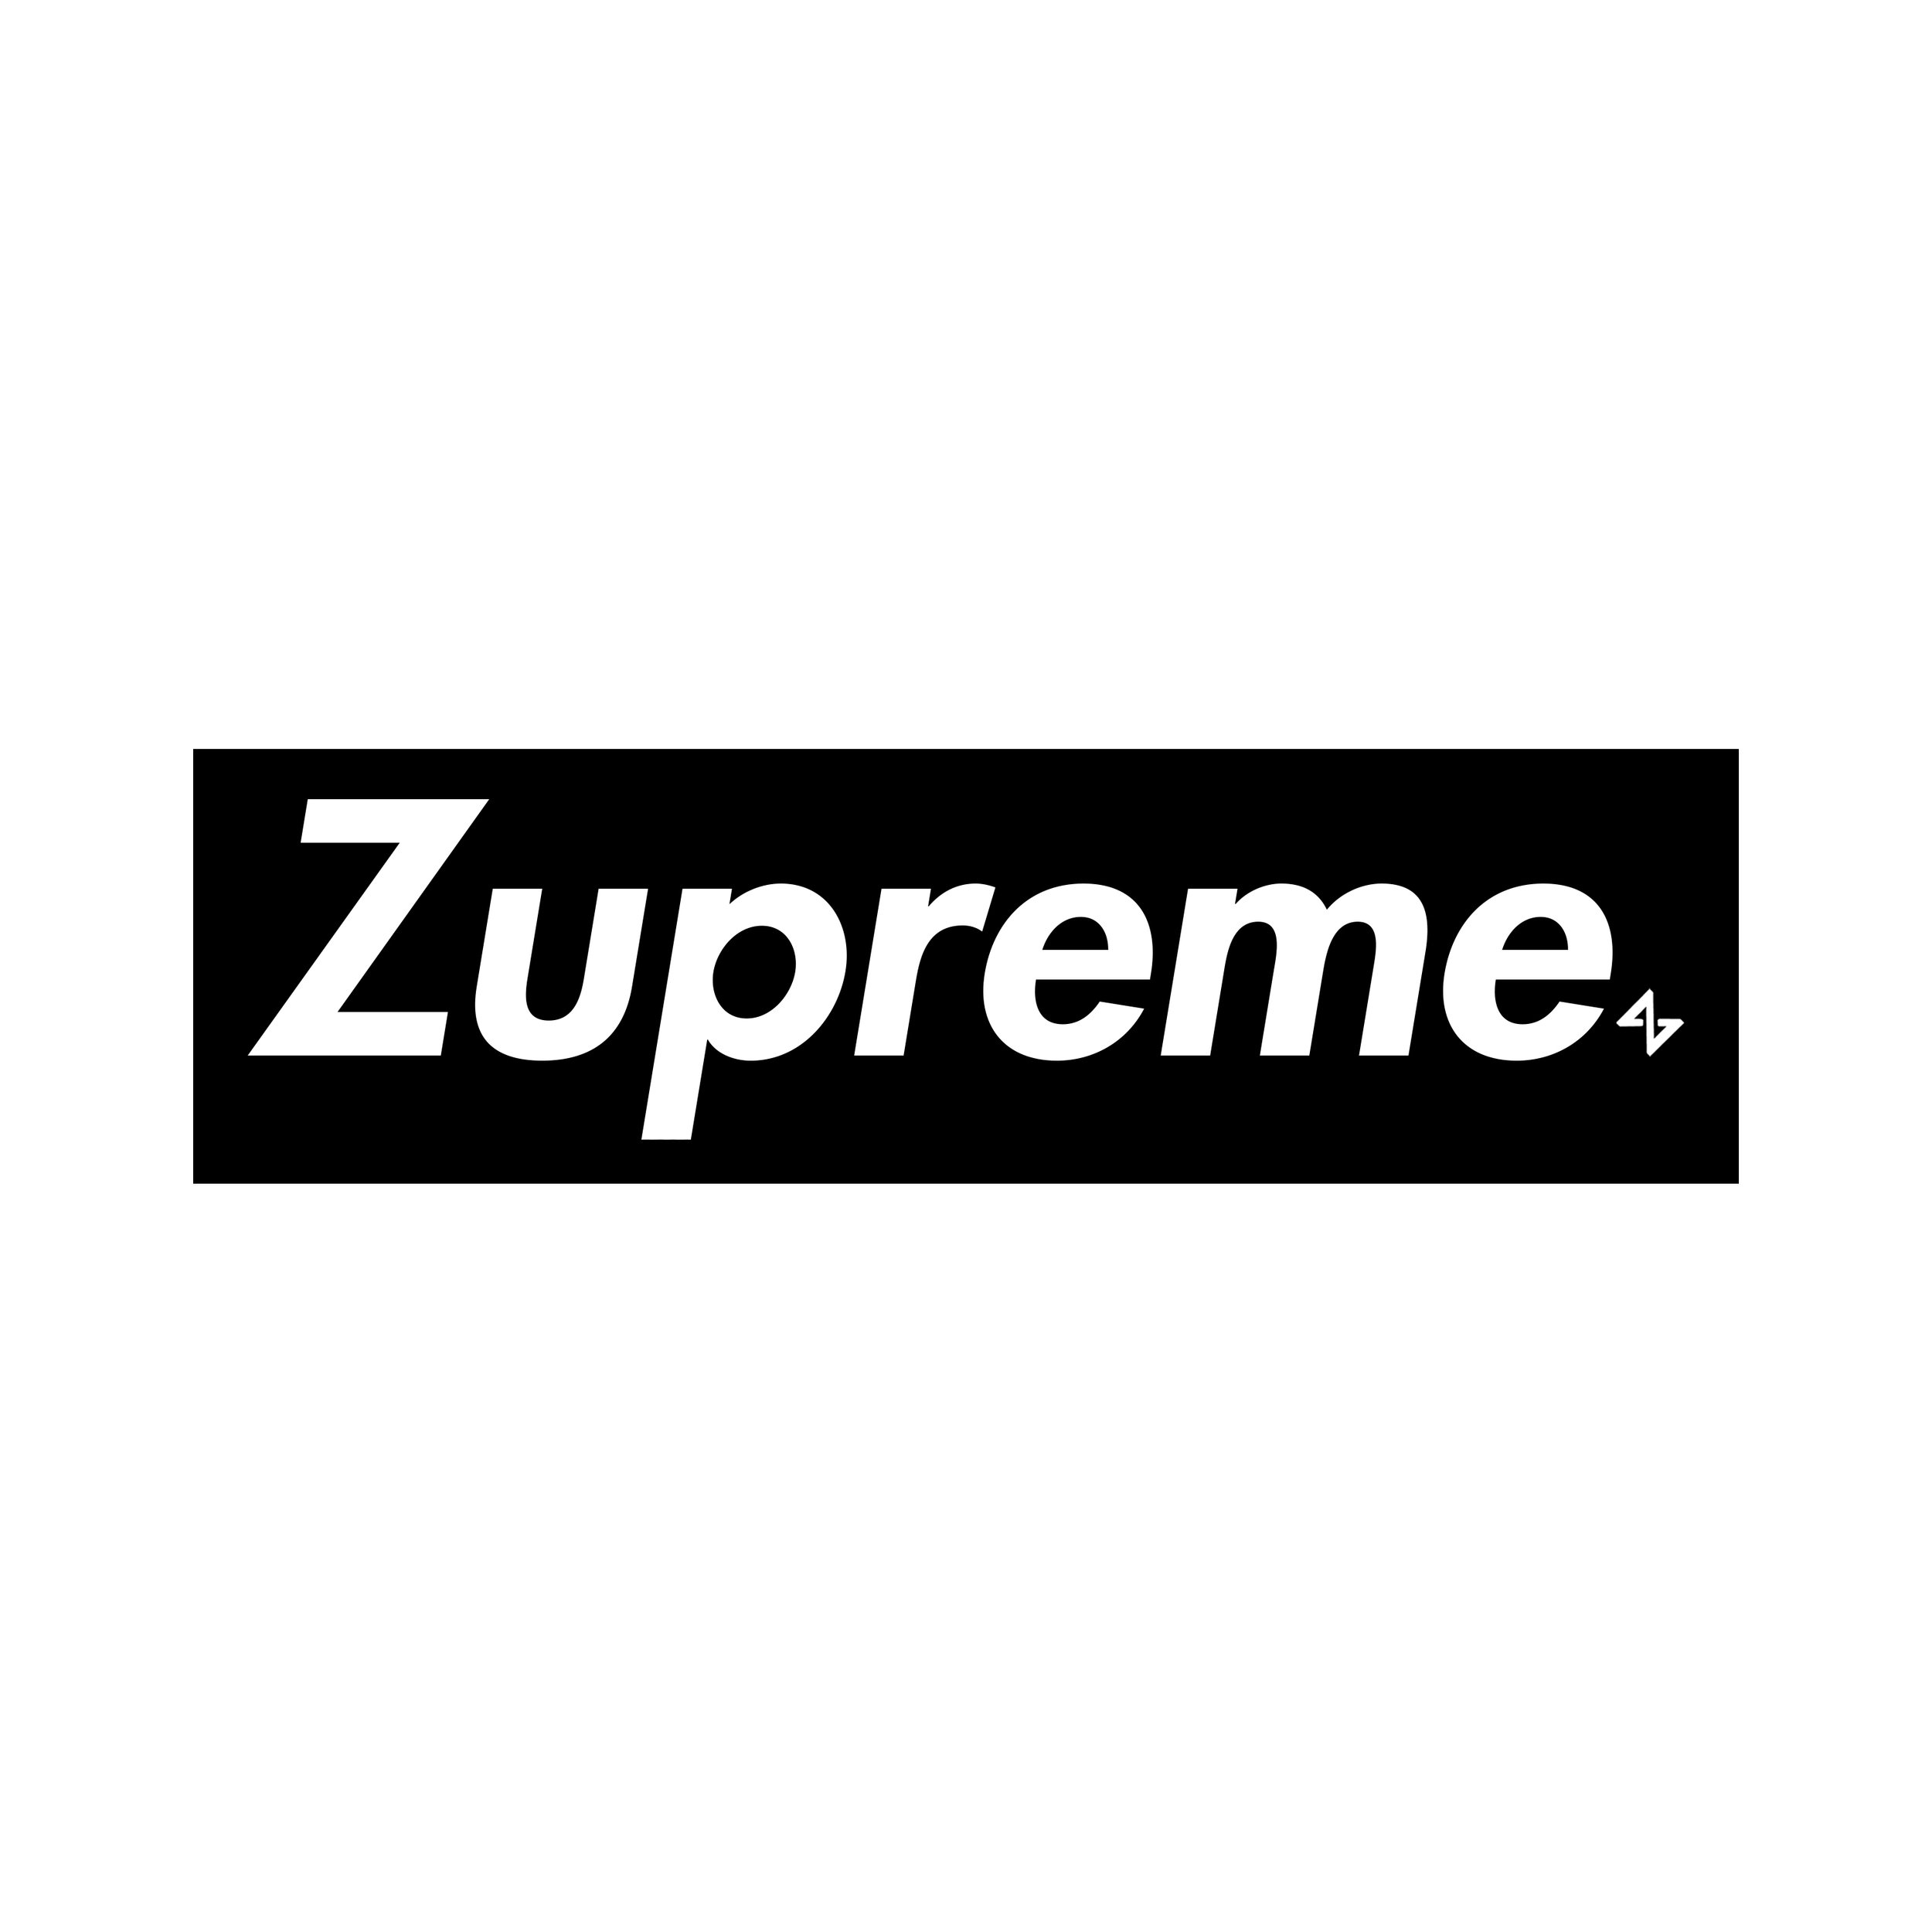 Zupreme Black